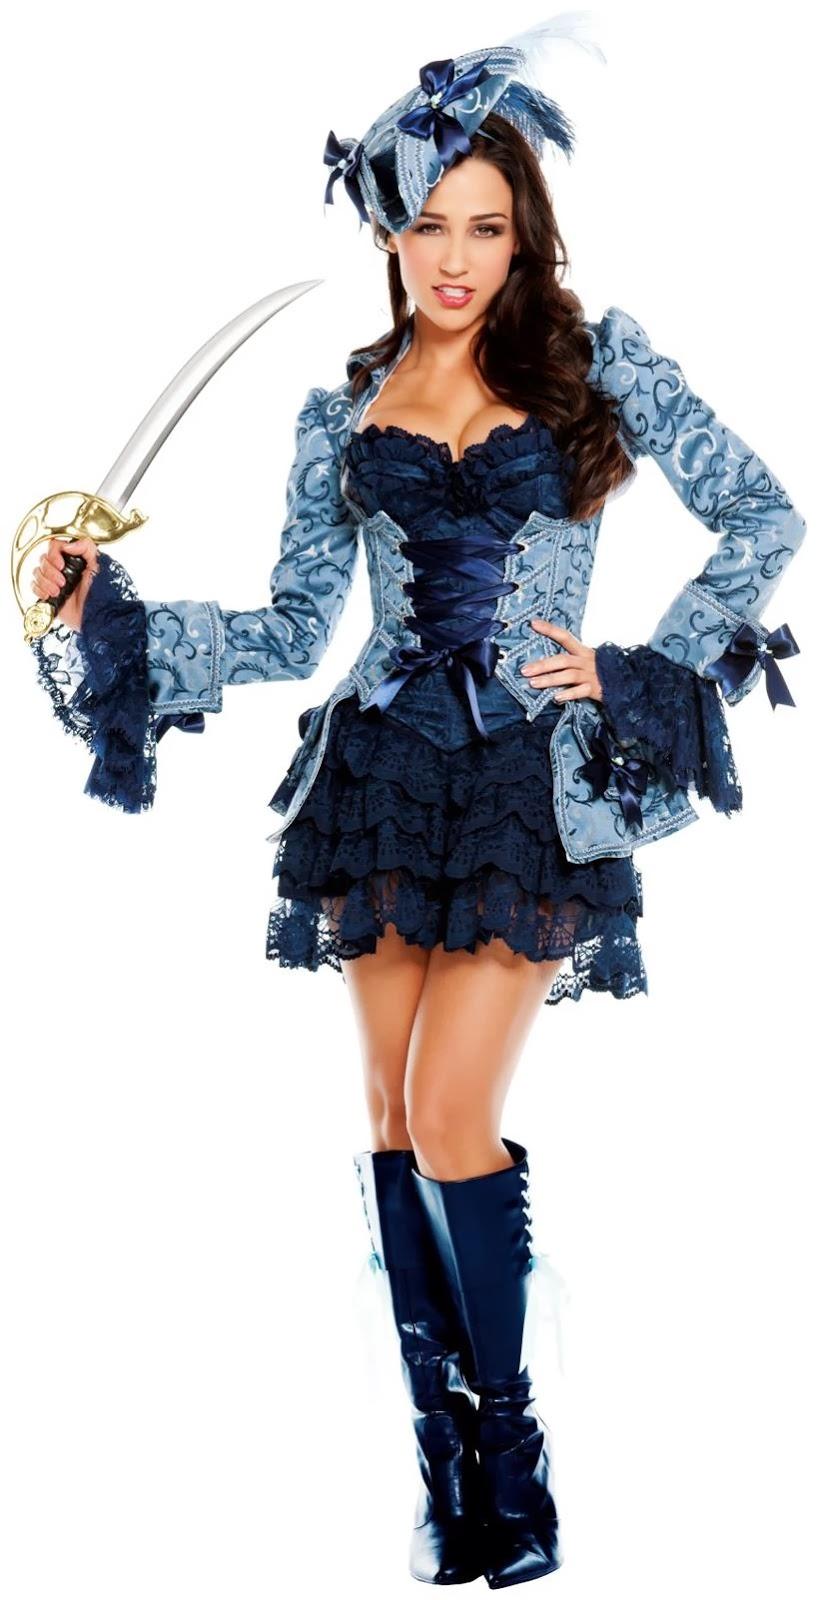 Blue Victoriau0027s Pirate Adult Costume  sc 1 st  Popular Halloween Costumes & Popular Halloween Costumes : Pirate Costumes for Women - Pirate ...